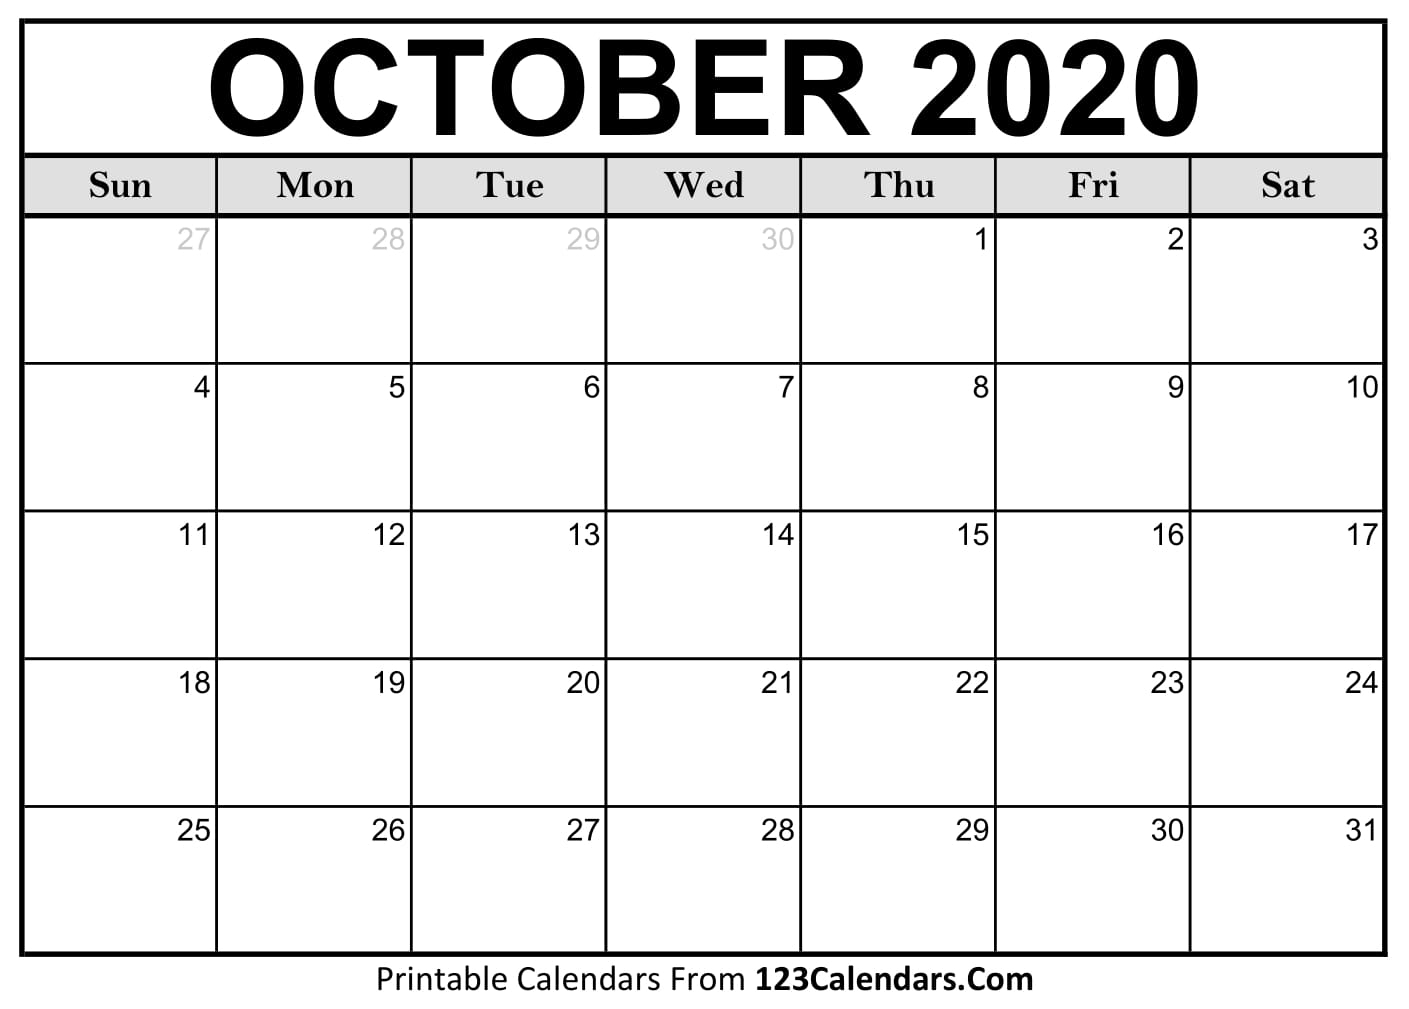 October 2020 Printable Calendar | 123Calendars